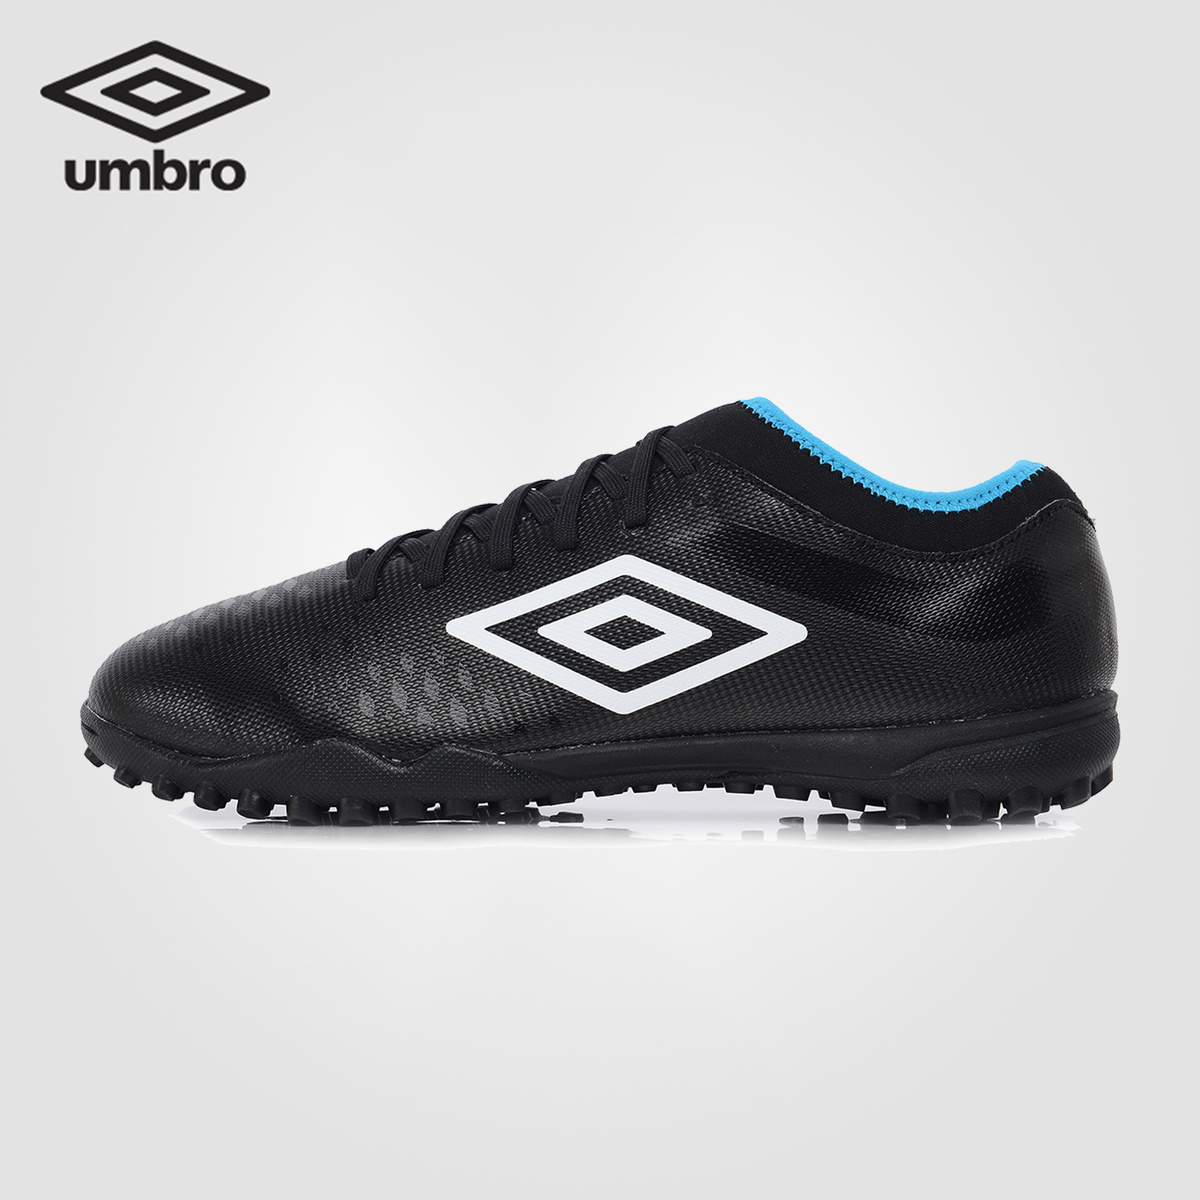 zapatos de futbol umbro 2018 hombres